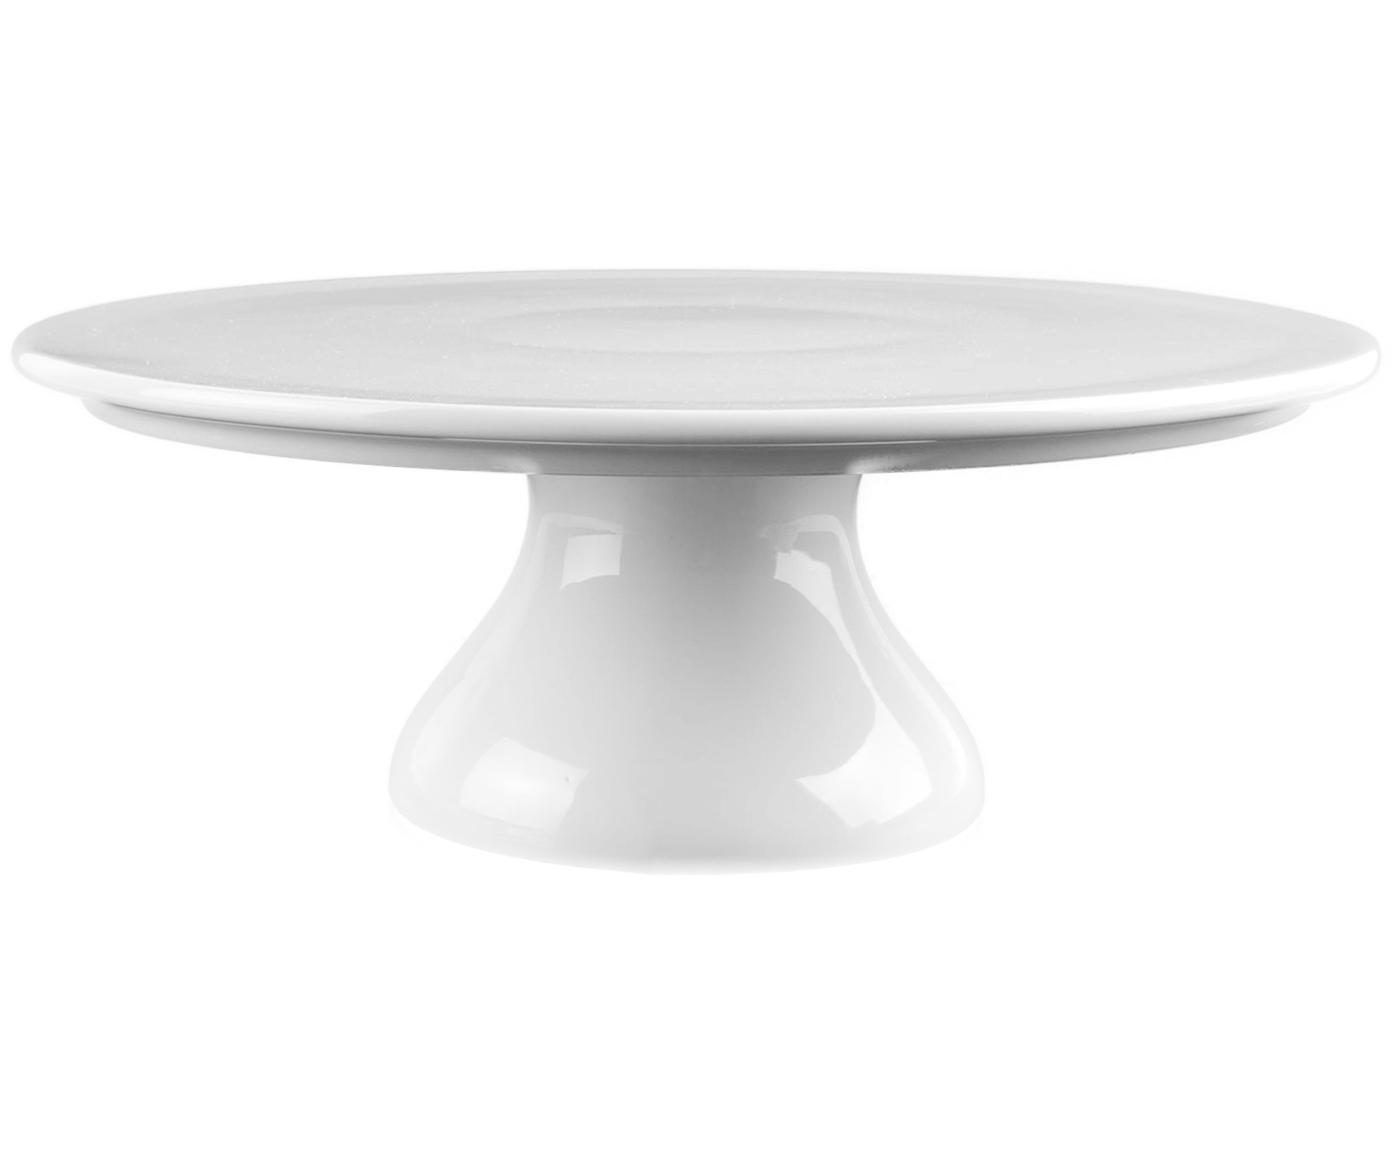 Taartplateau Fonia, Porselein, Wit, Ø 25 x H 9 cm